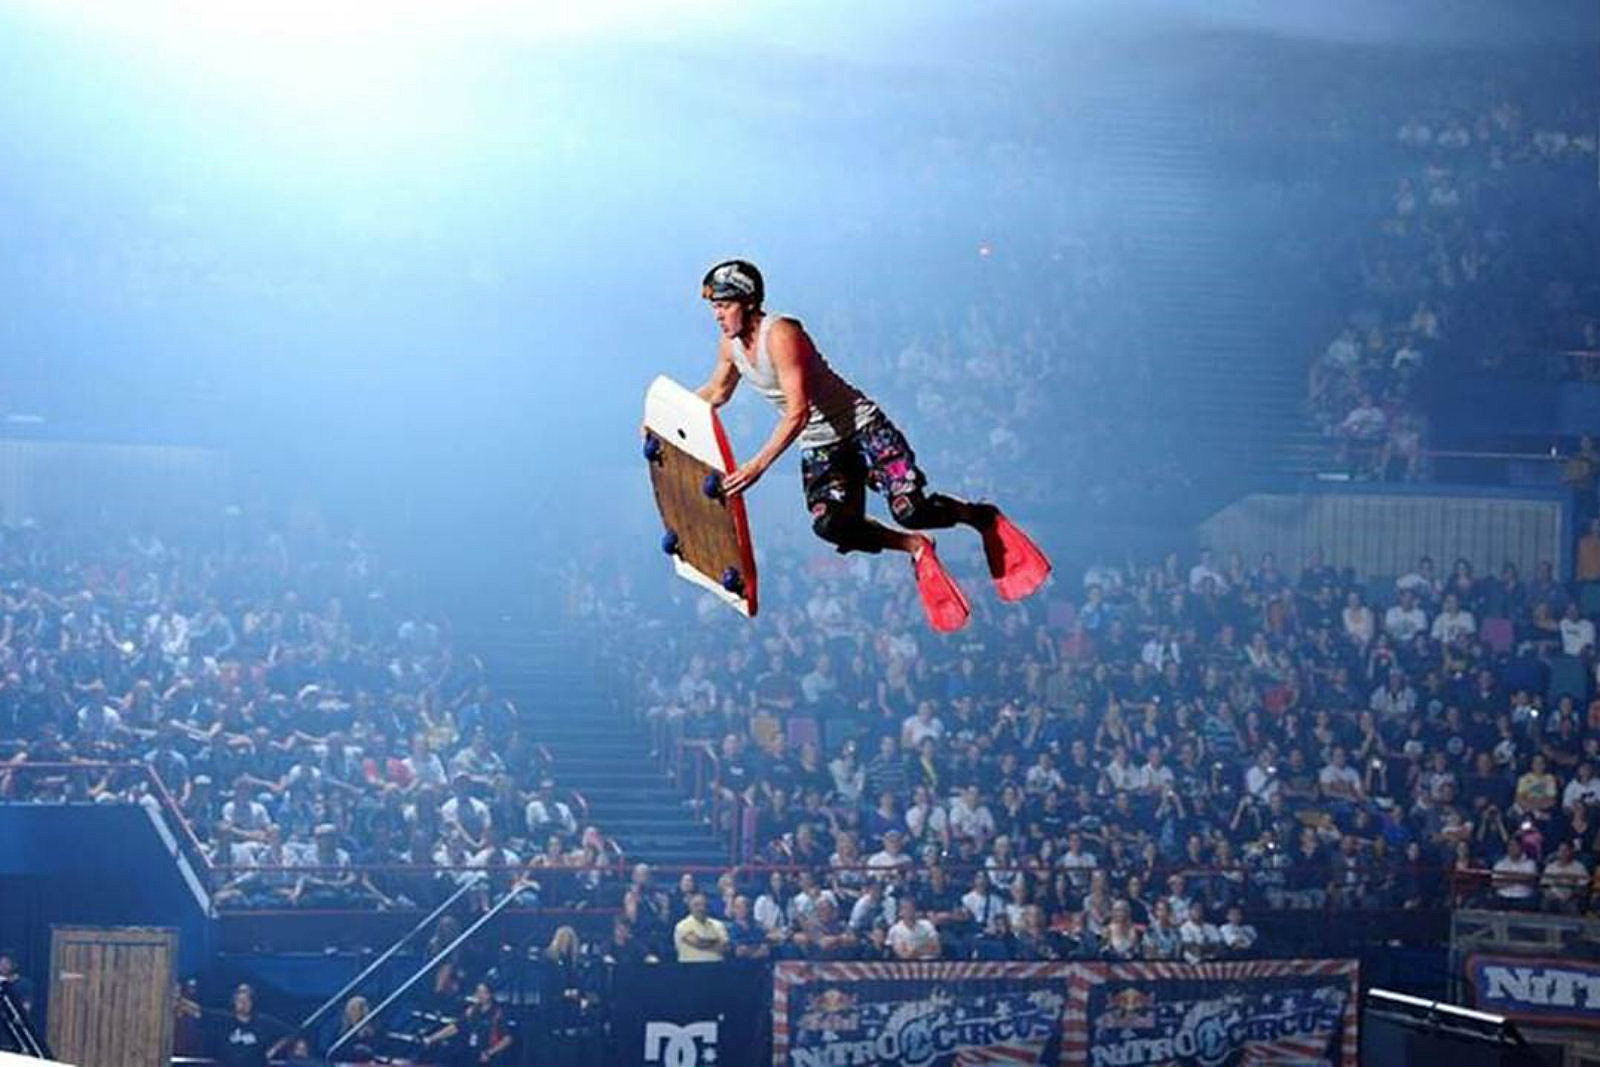 Andy Coscarelli (for Nitro Circus Live)